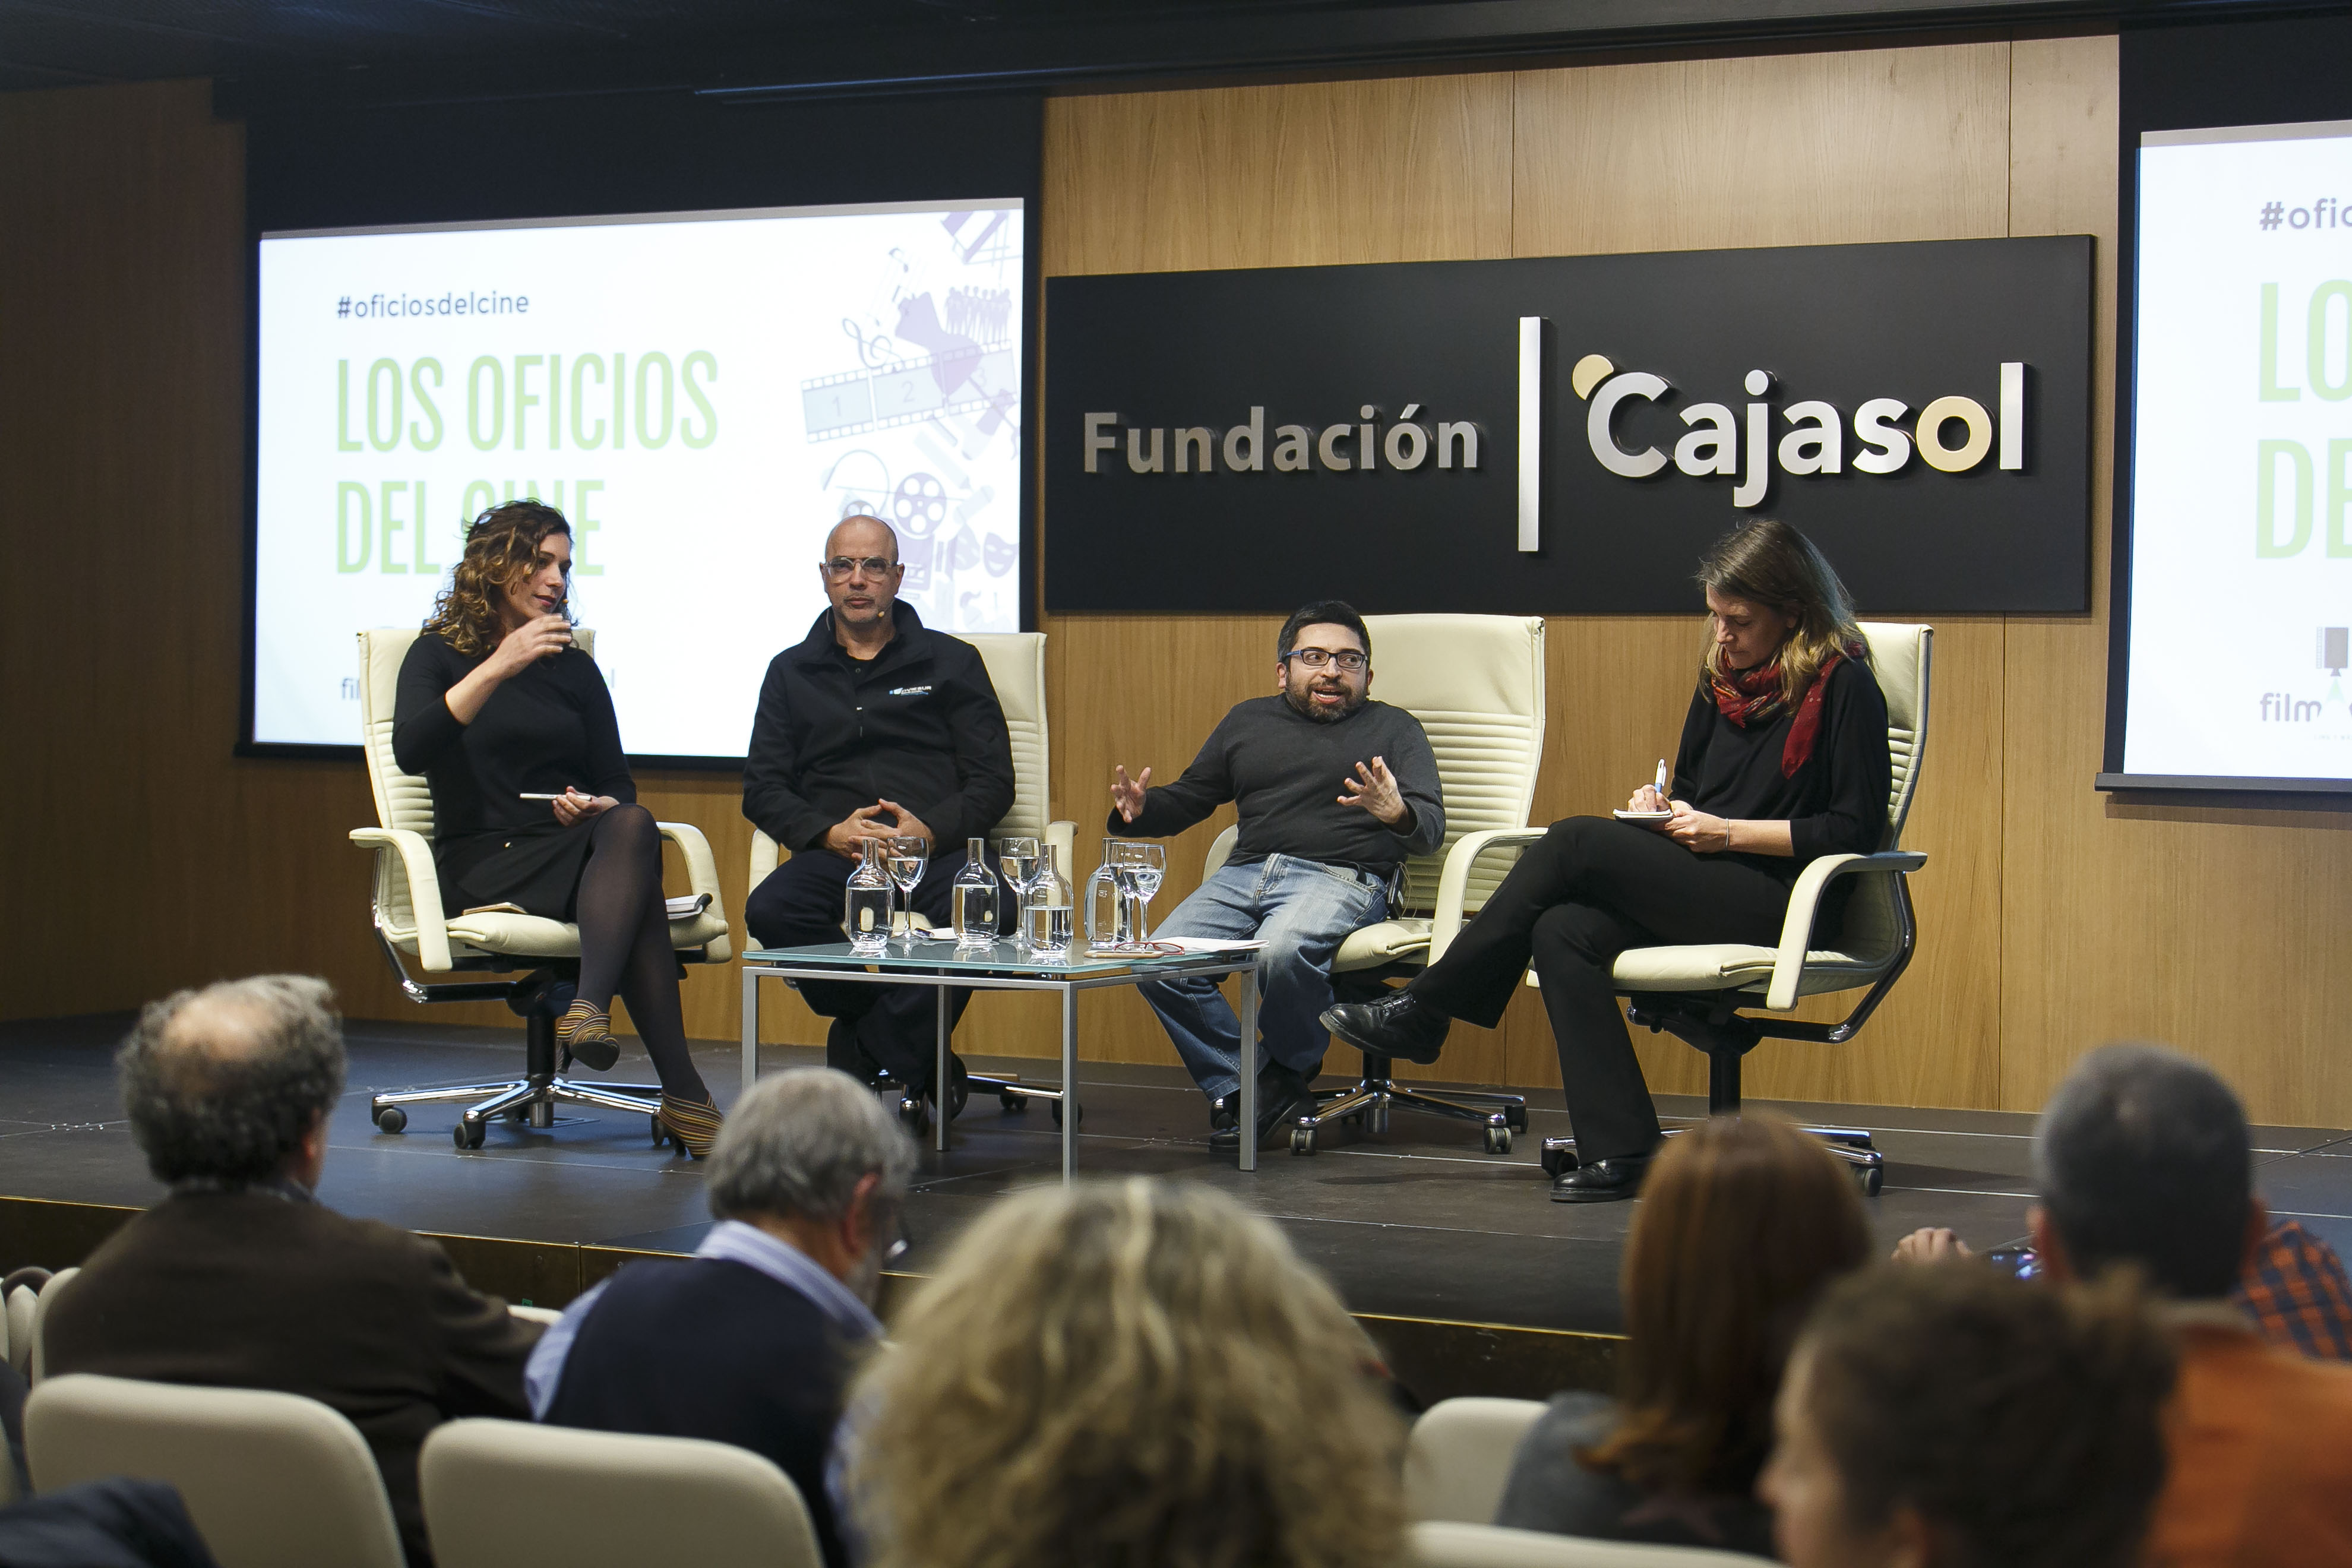 Agus Jiménez, Ernesto Chao, Juan Antonio Bermúdez y Manuela Ocón.